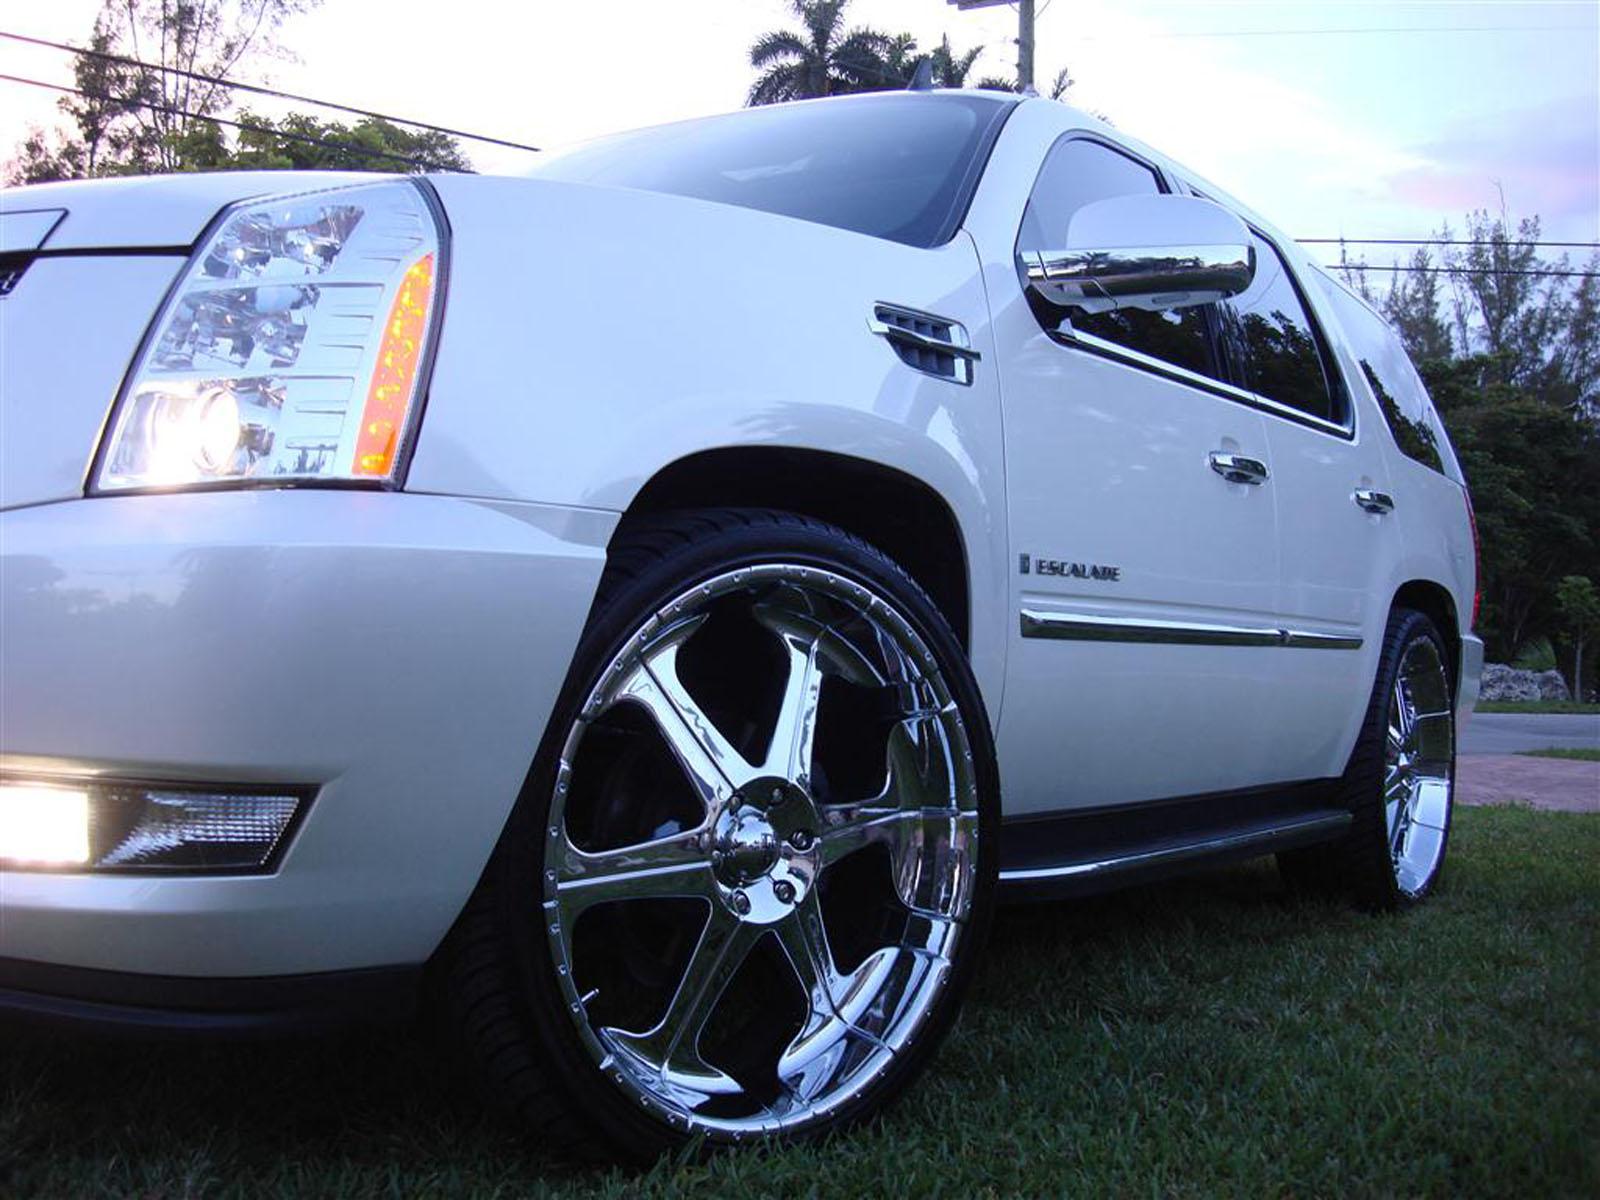 la sales winnsboro sale best llc at stop escalade inventory details auto in for cadillac